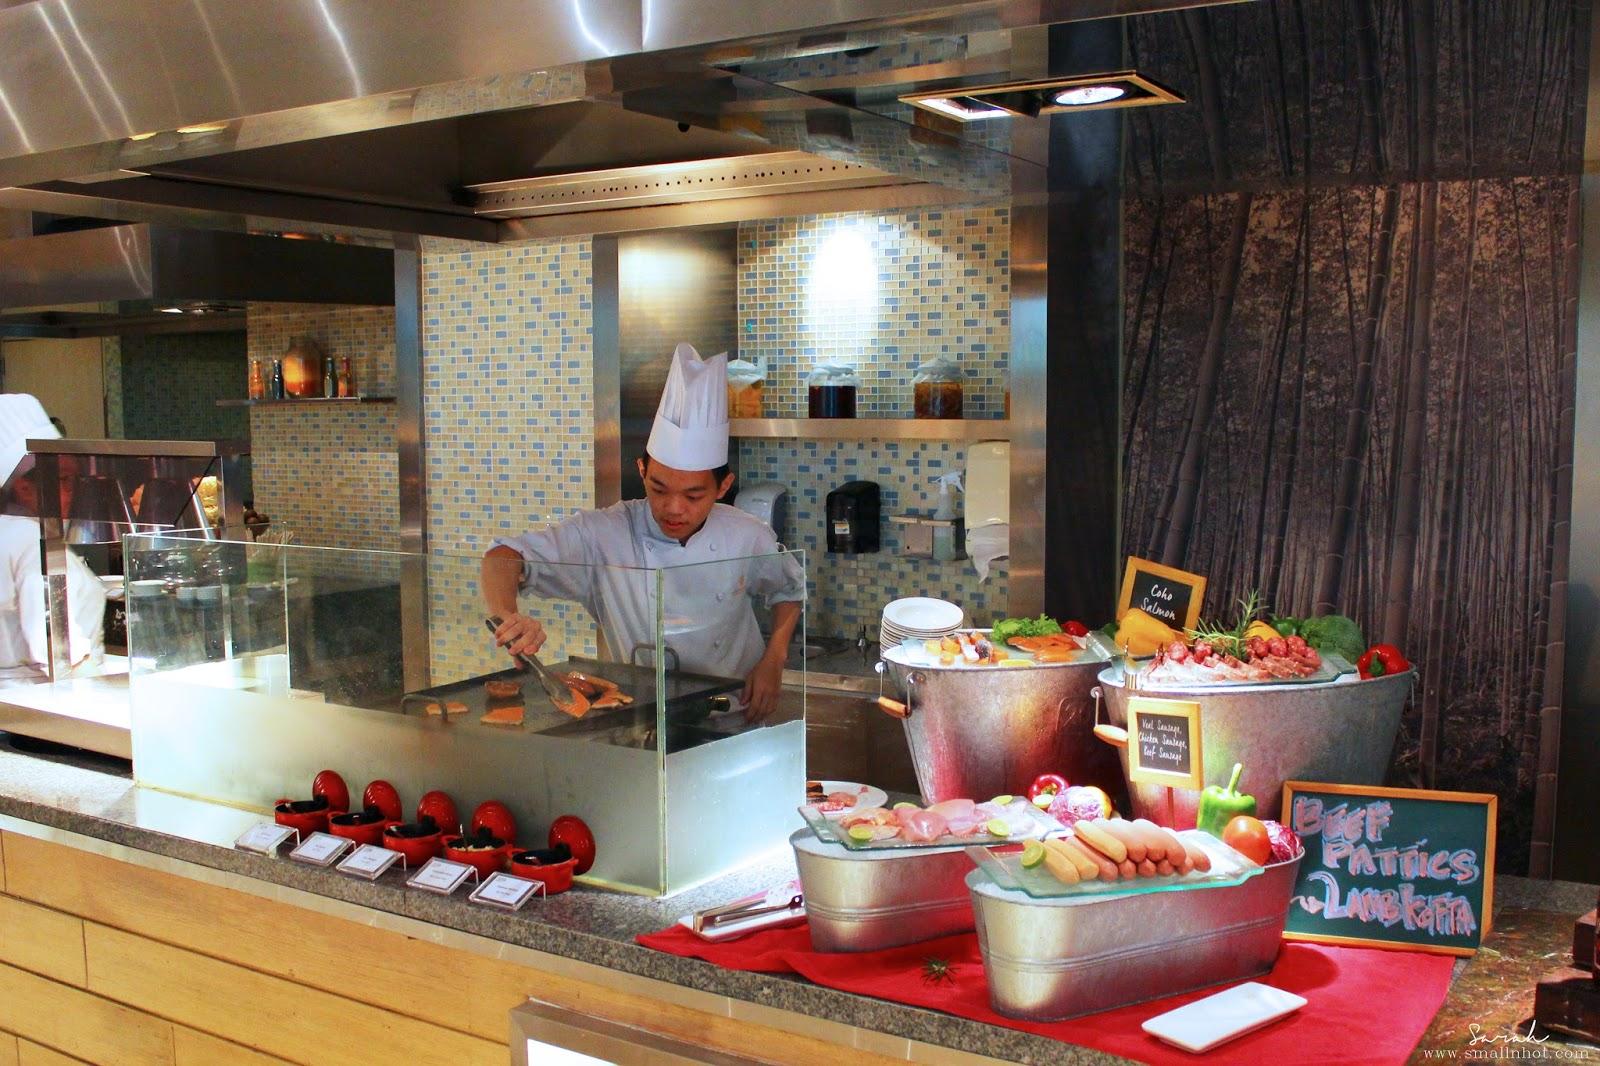 Sunday Bubbly Brunch Buffet @ Serena Brasserie, InterContinental Hotel KL - Small N Hot ...